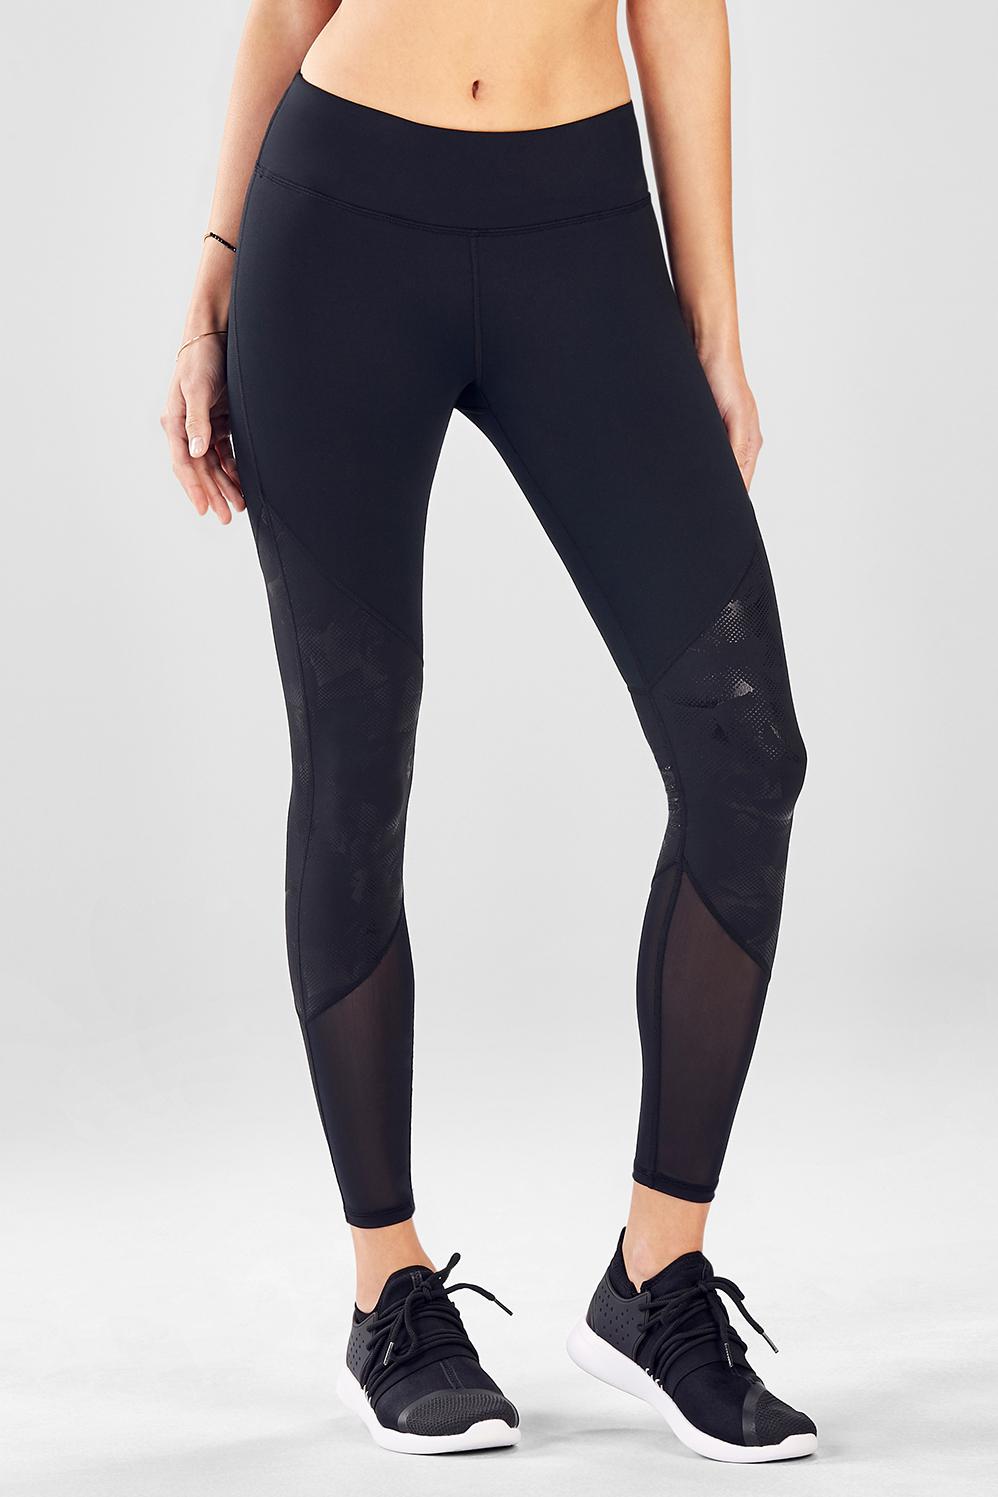 1aed3f8e59c28f Salar Mesh PowerHold® Legging - Black/Rosetta